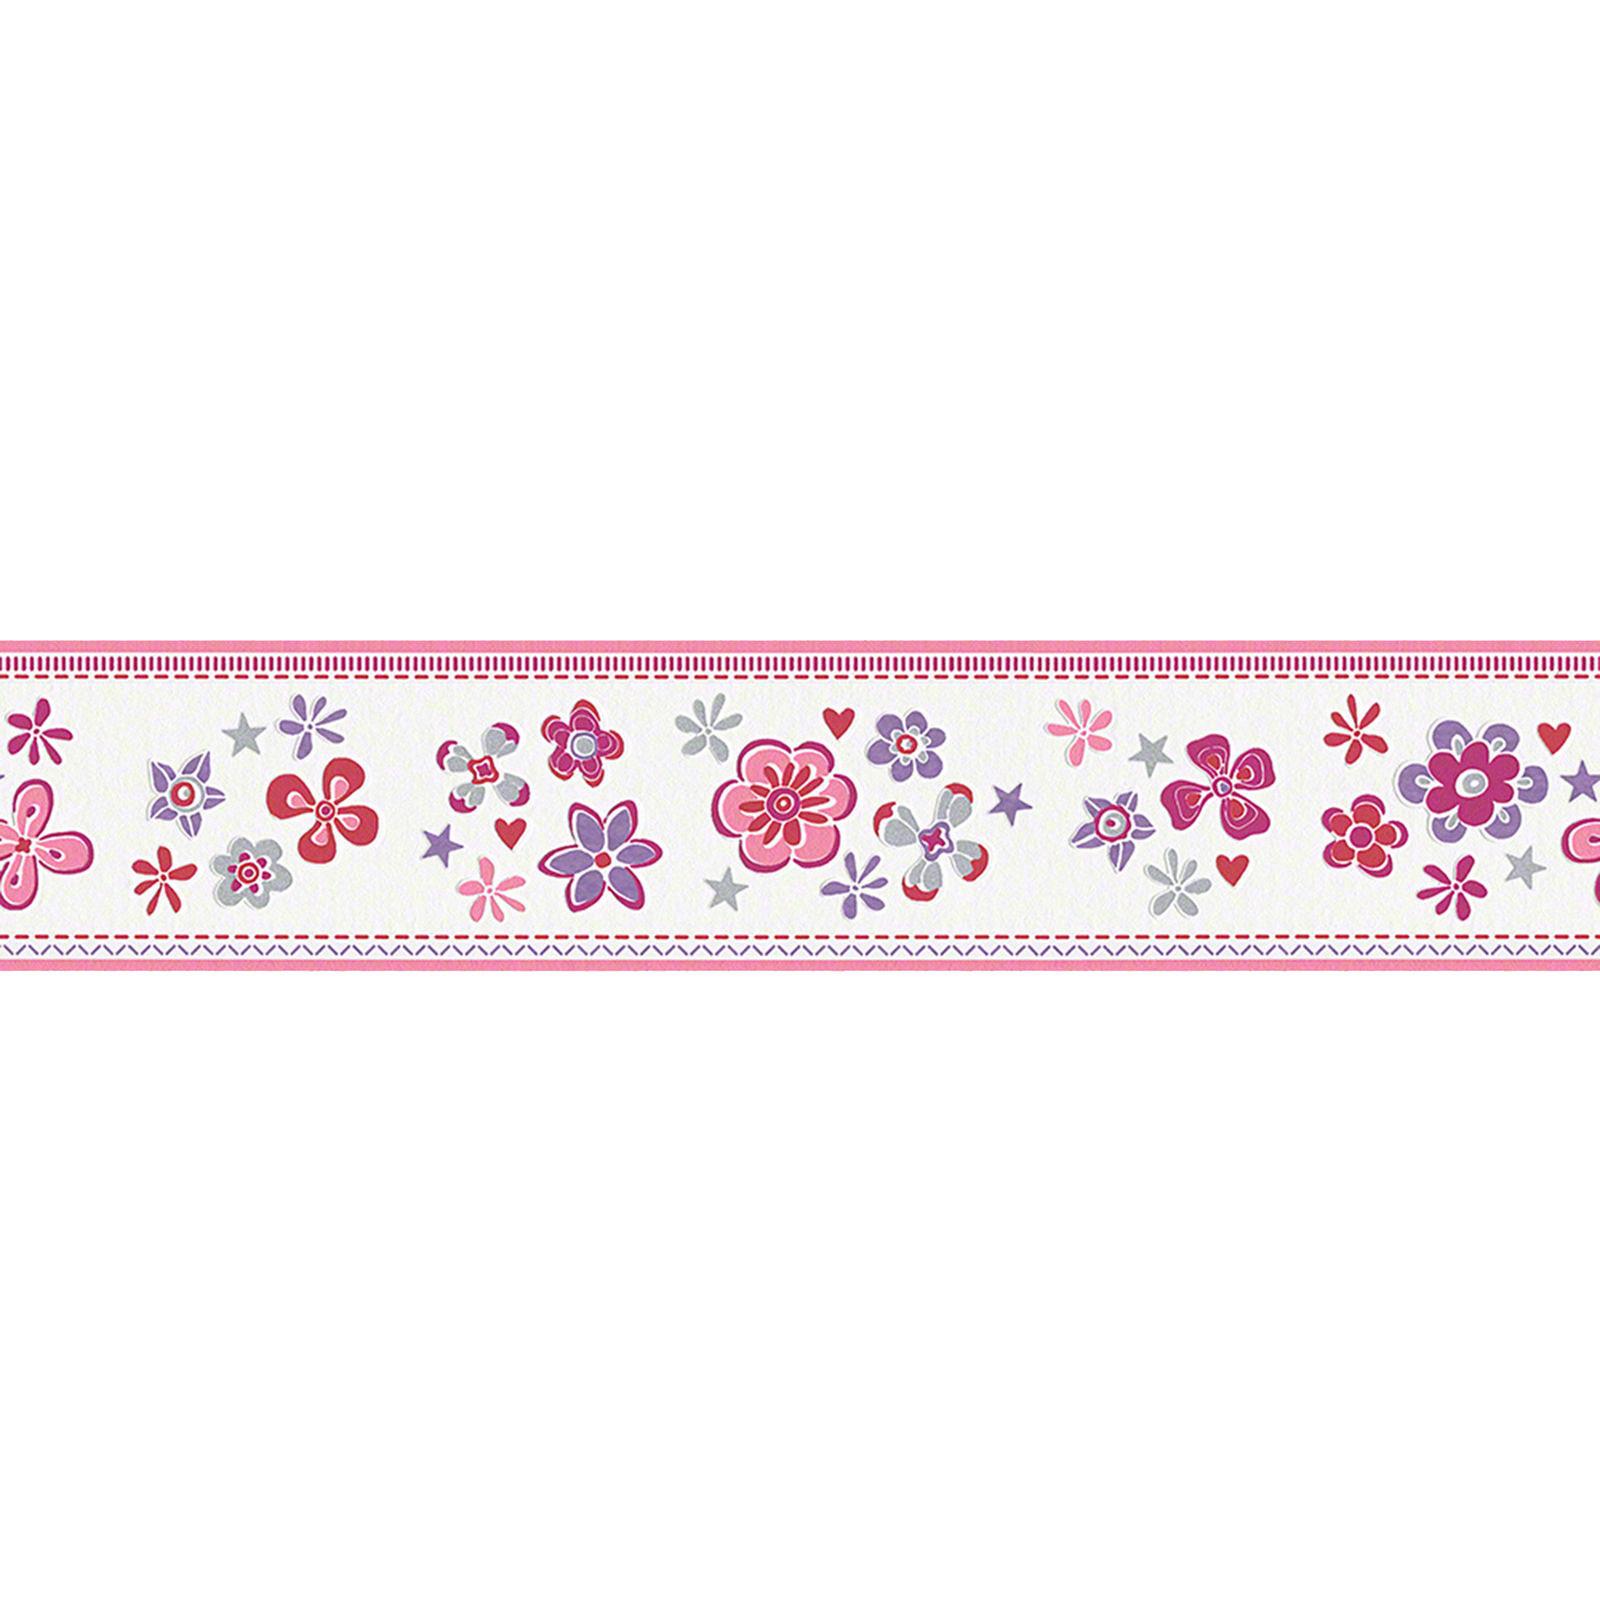 Bordüre Kindertapete Blumen Muster Lila Pink Herz Rot Stern Silber Esprit Kids